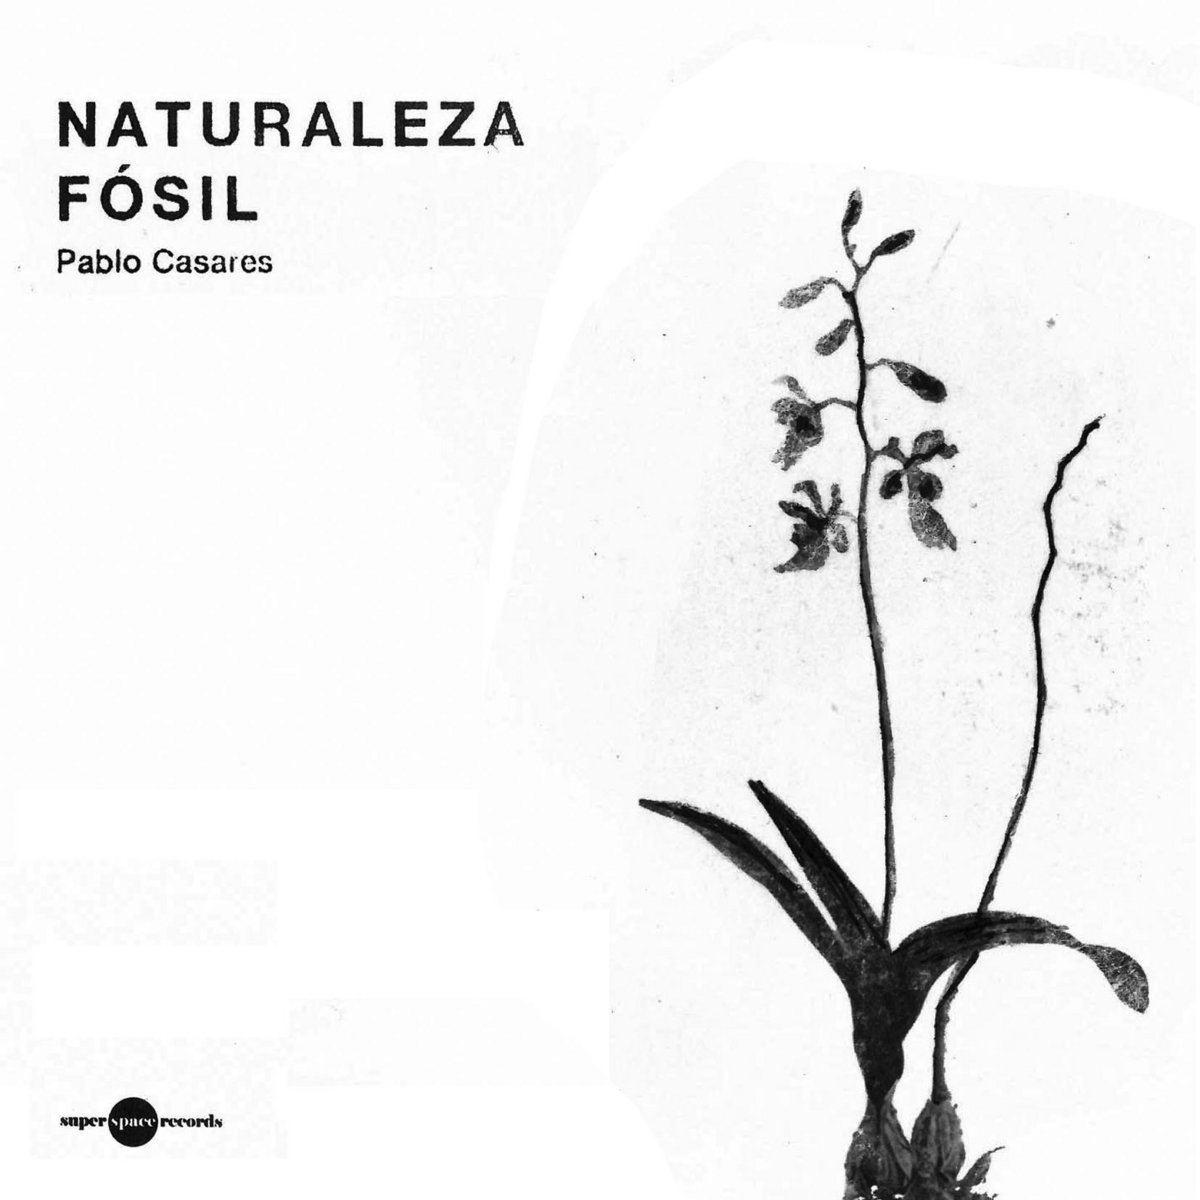 NATURALEZA FOSIL